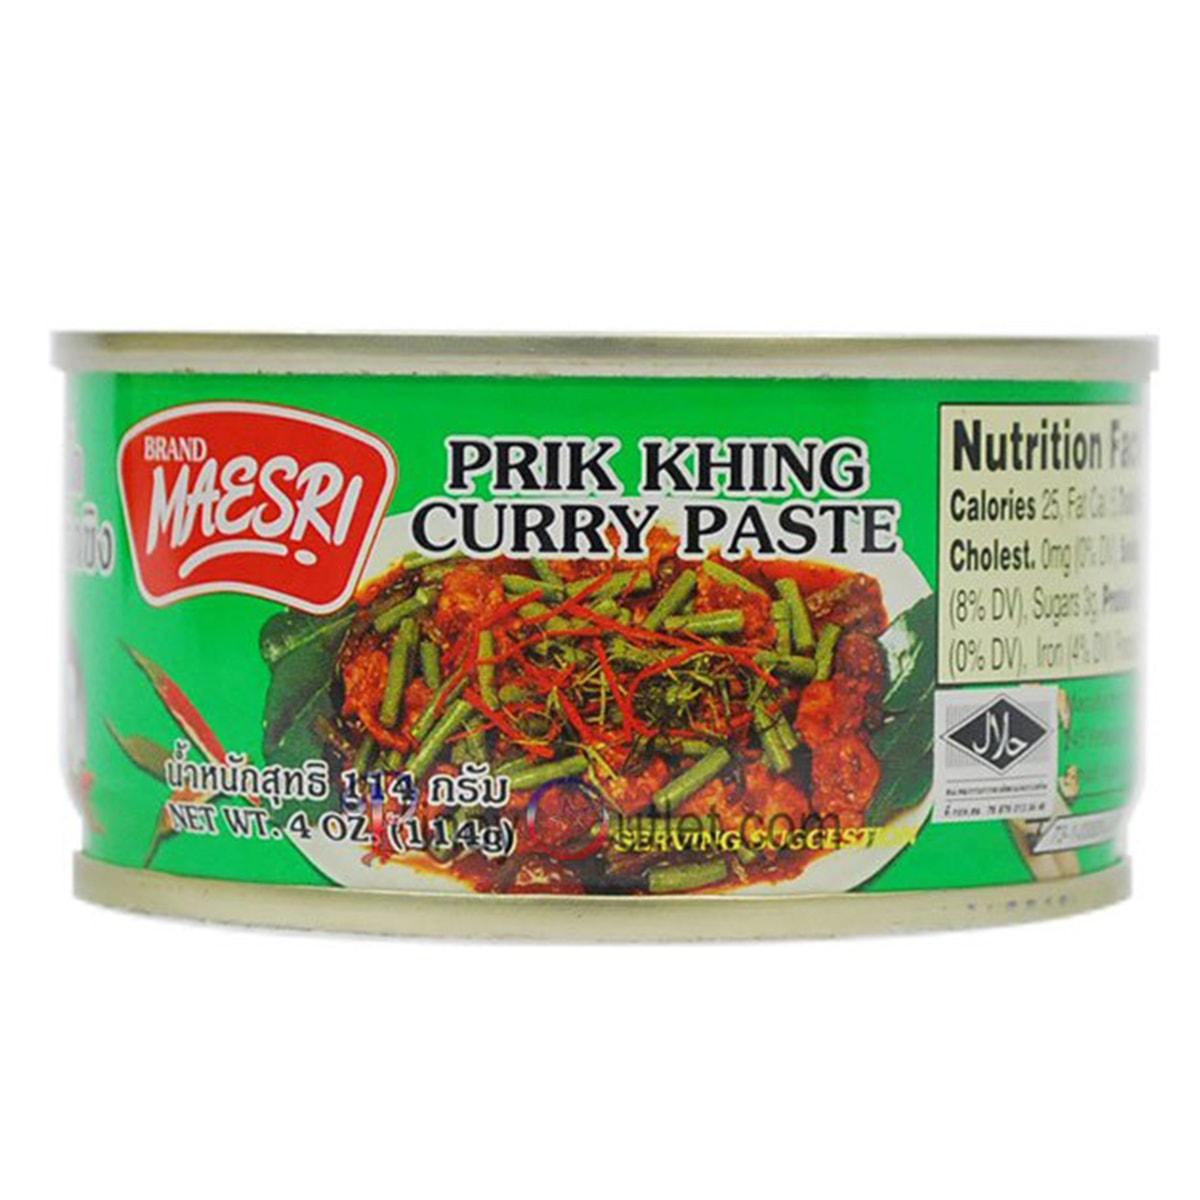 Buy Maesri Prik Khing Curry Paste - 114 gm